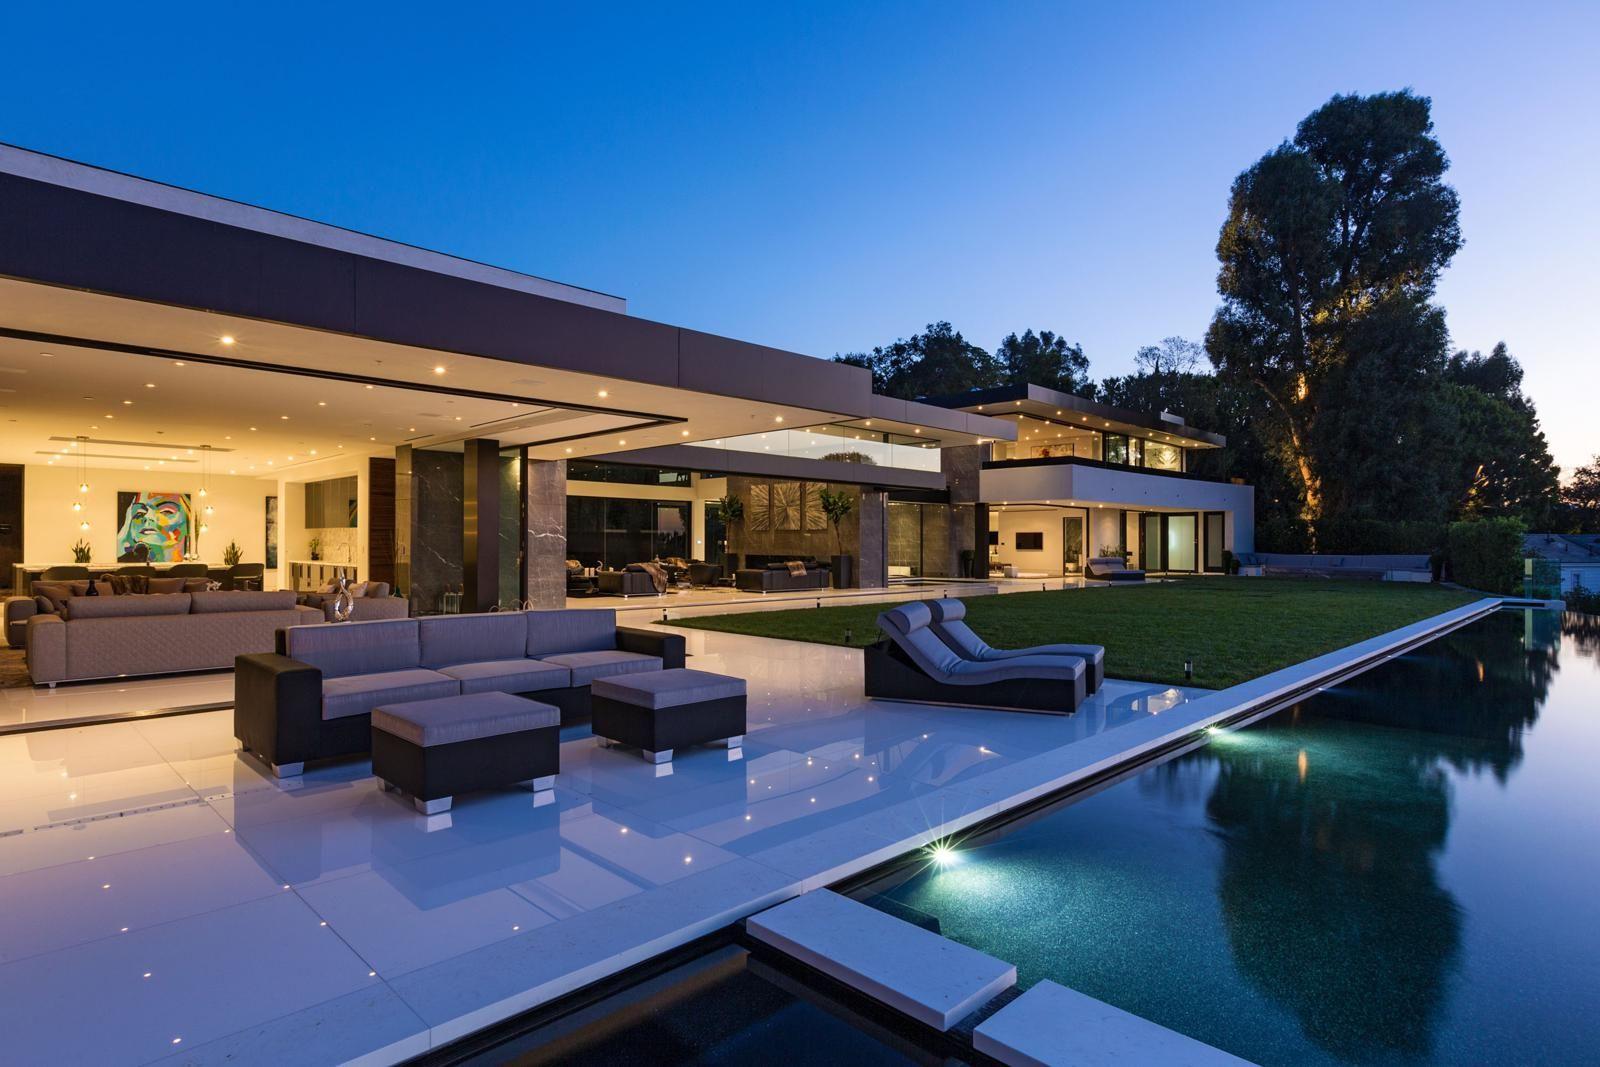 864 Stradella Bel Air House Designs Pinterest Bel